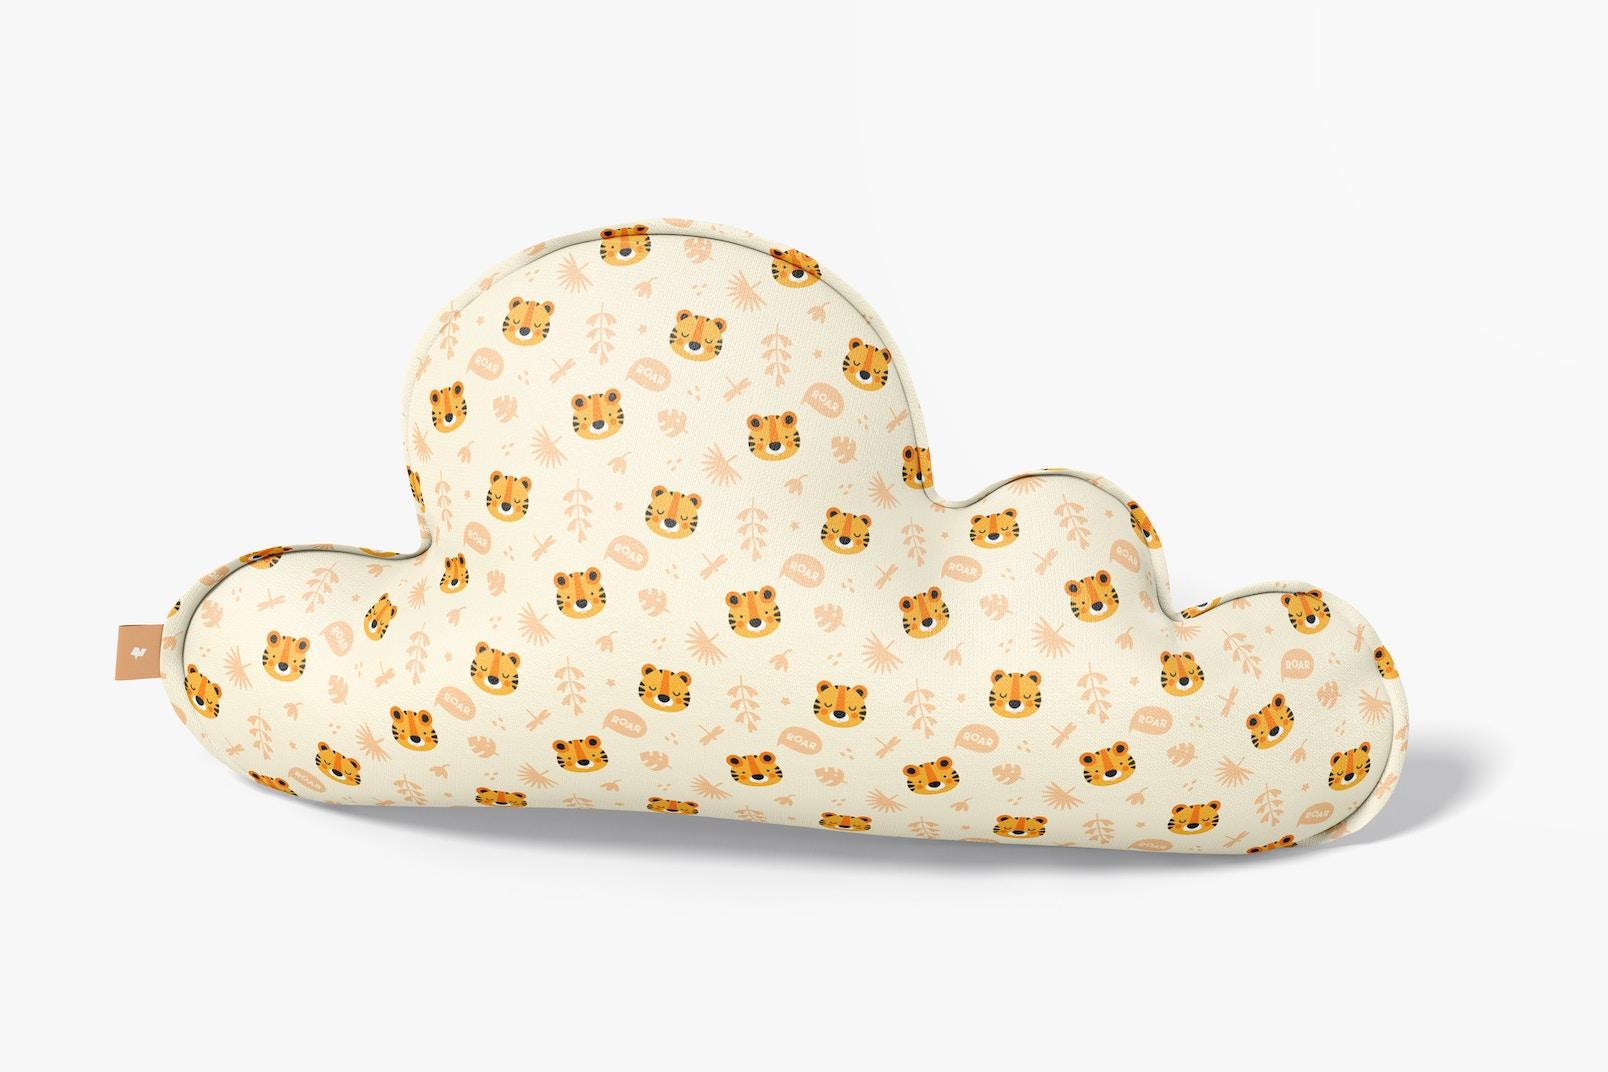 Cloud Pillow Mockup